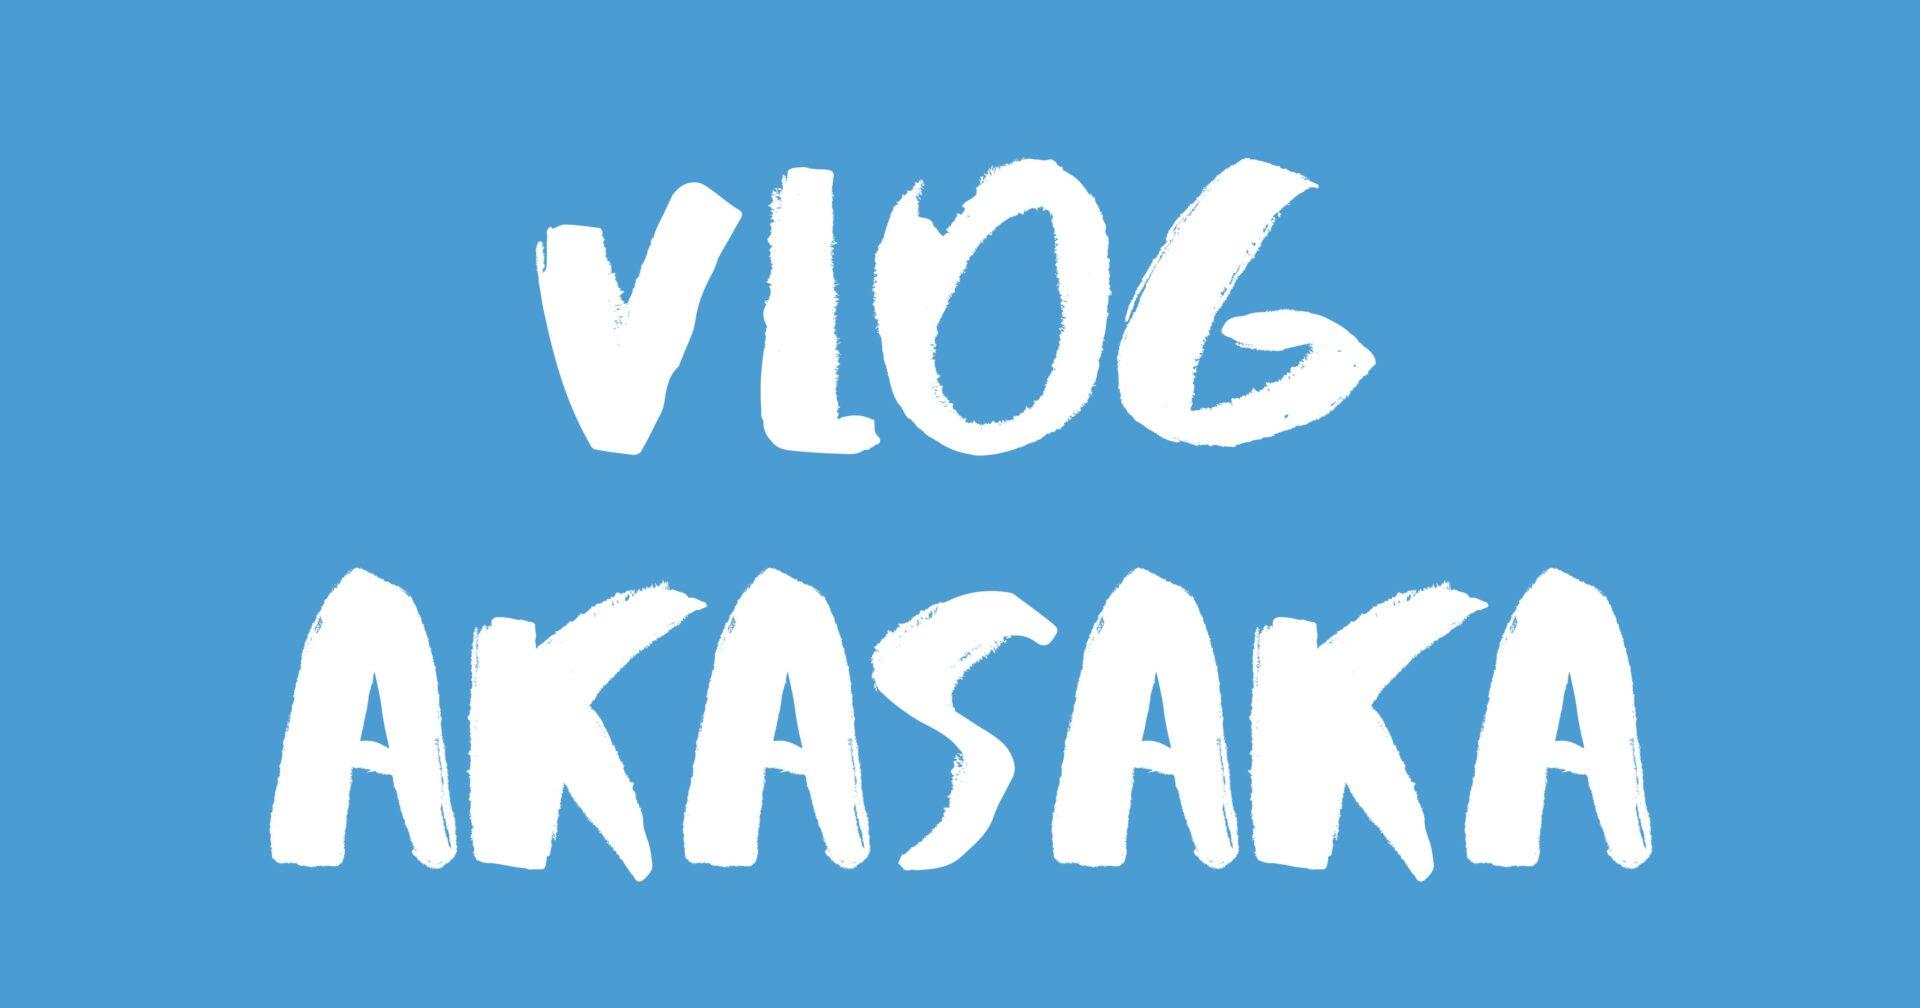 [Vlog] 赤坂 / Akasaka